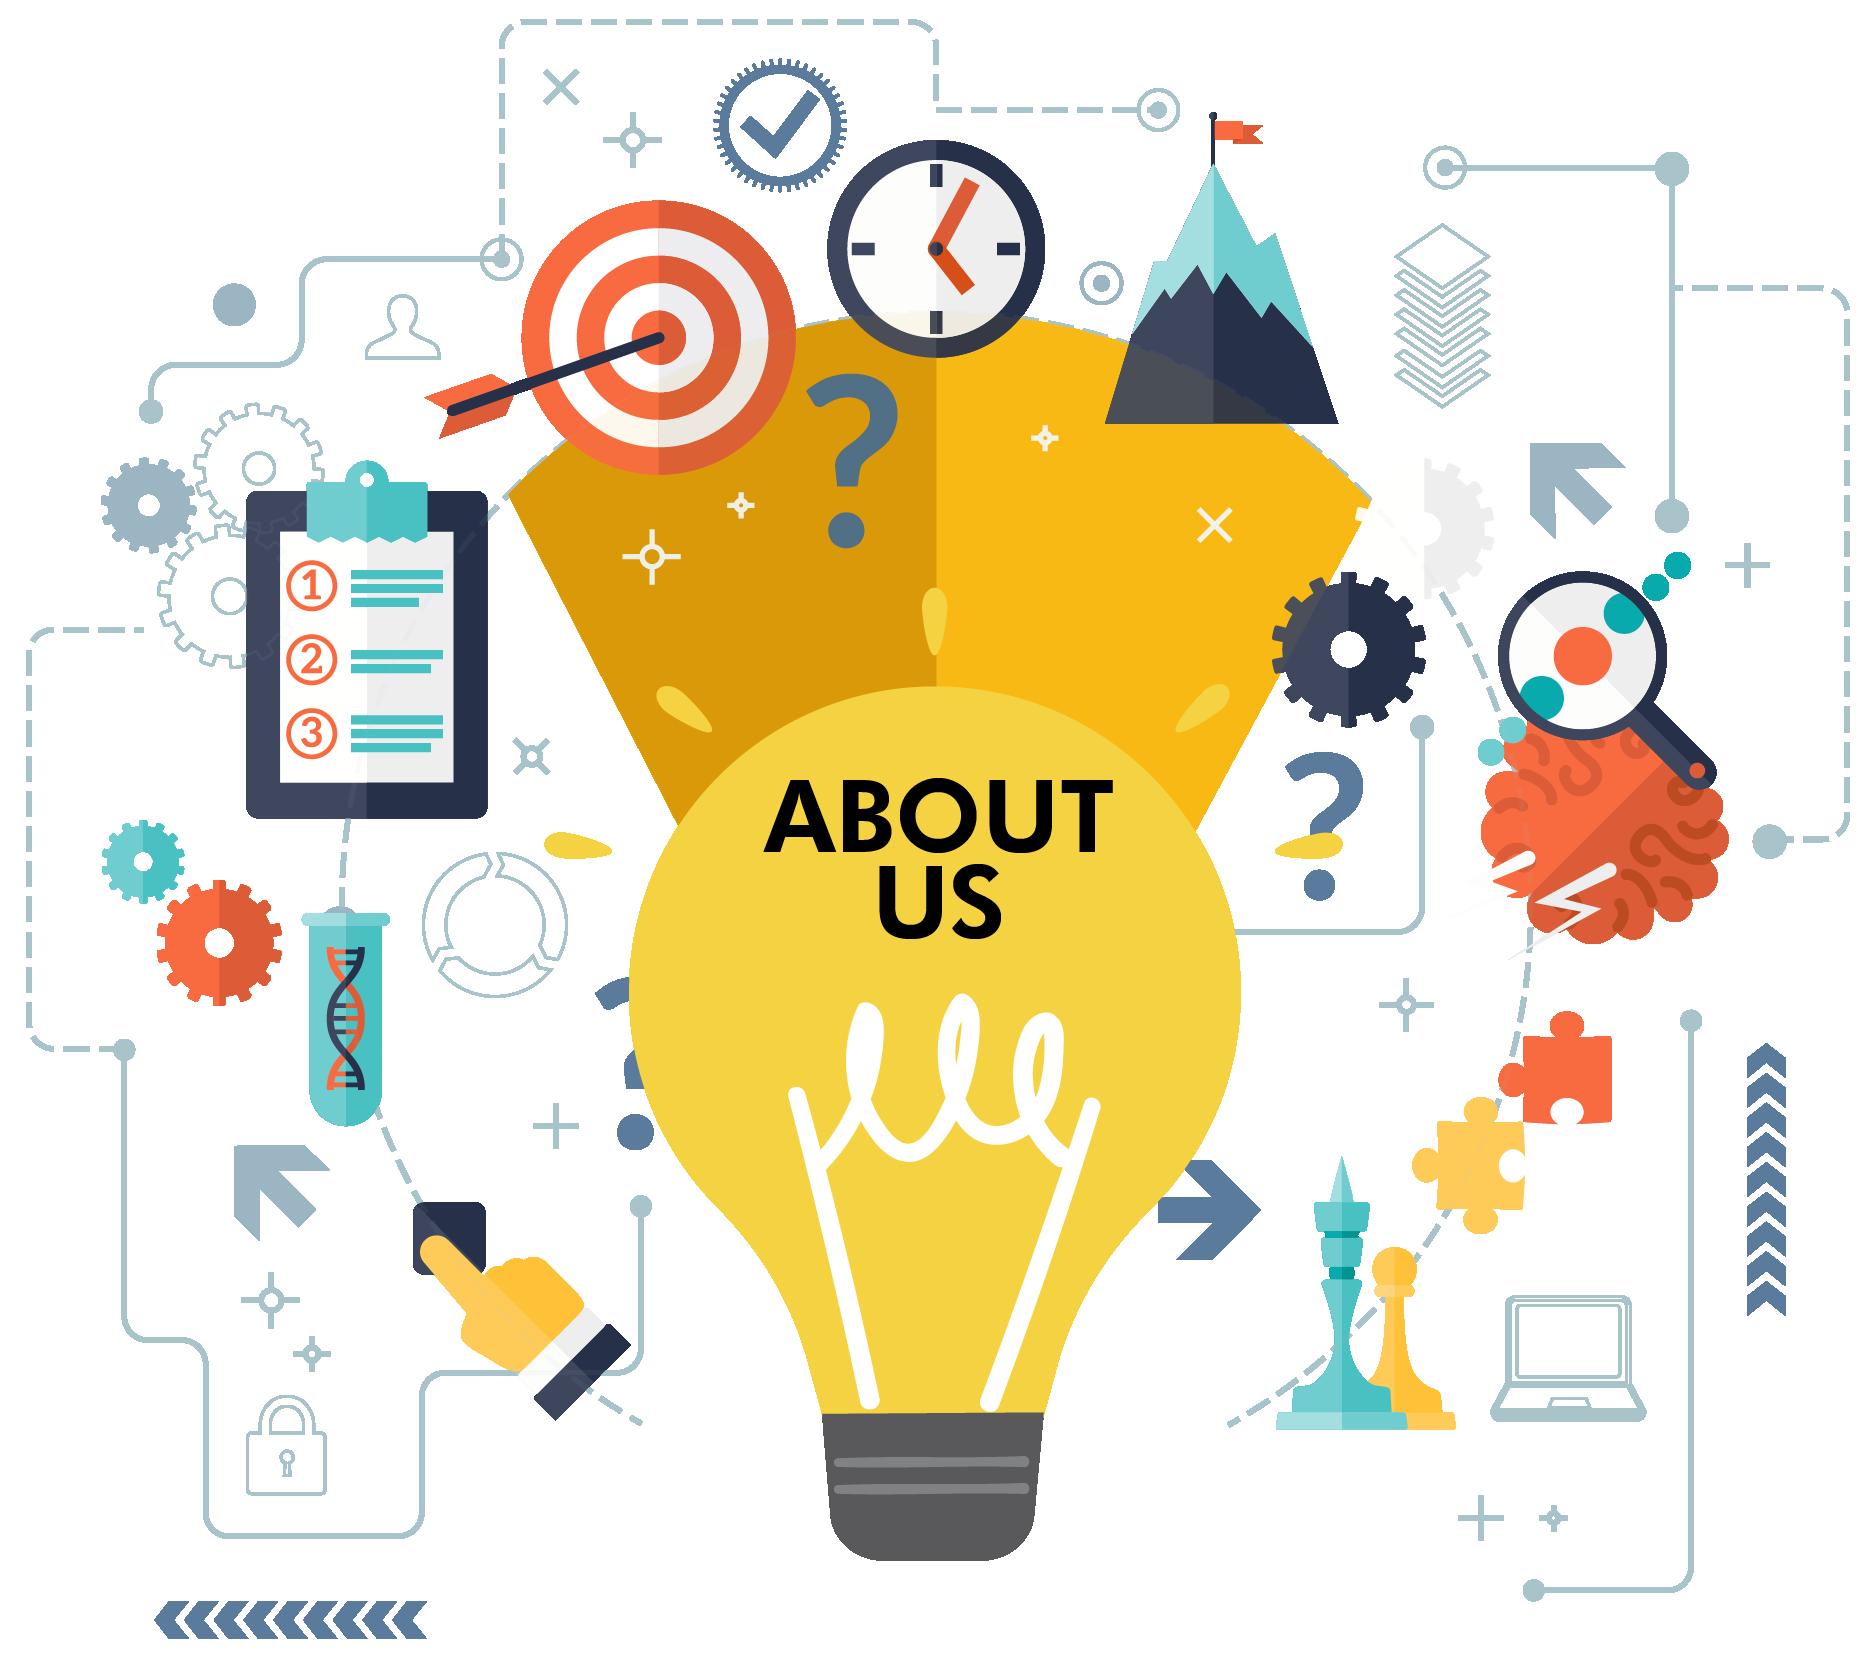 Ennoble IP | Trusted Advisor For IP In India